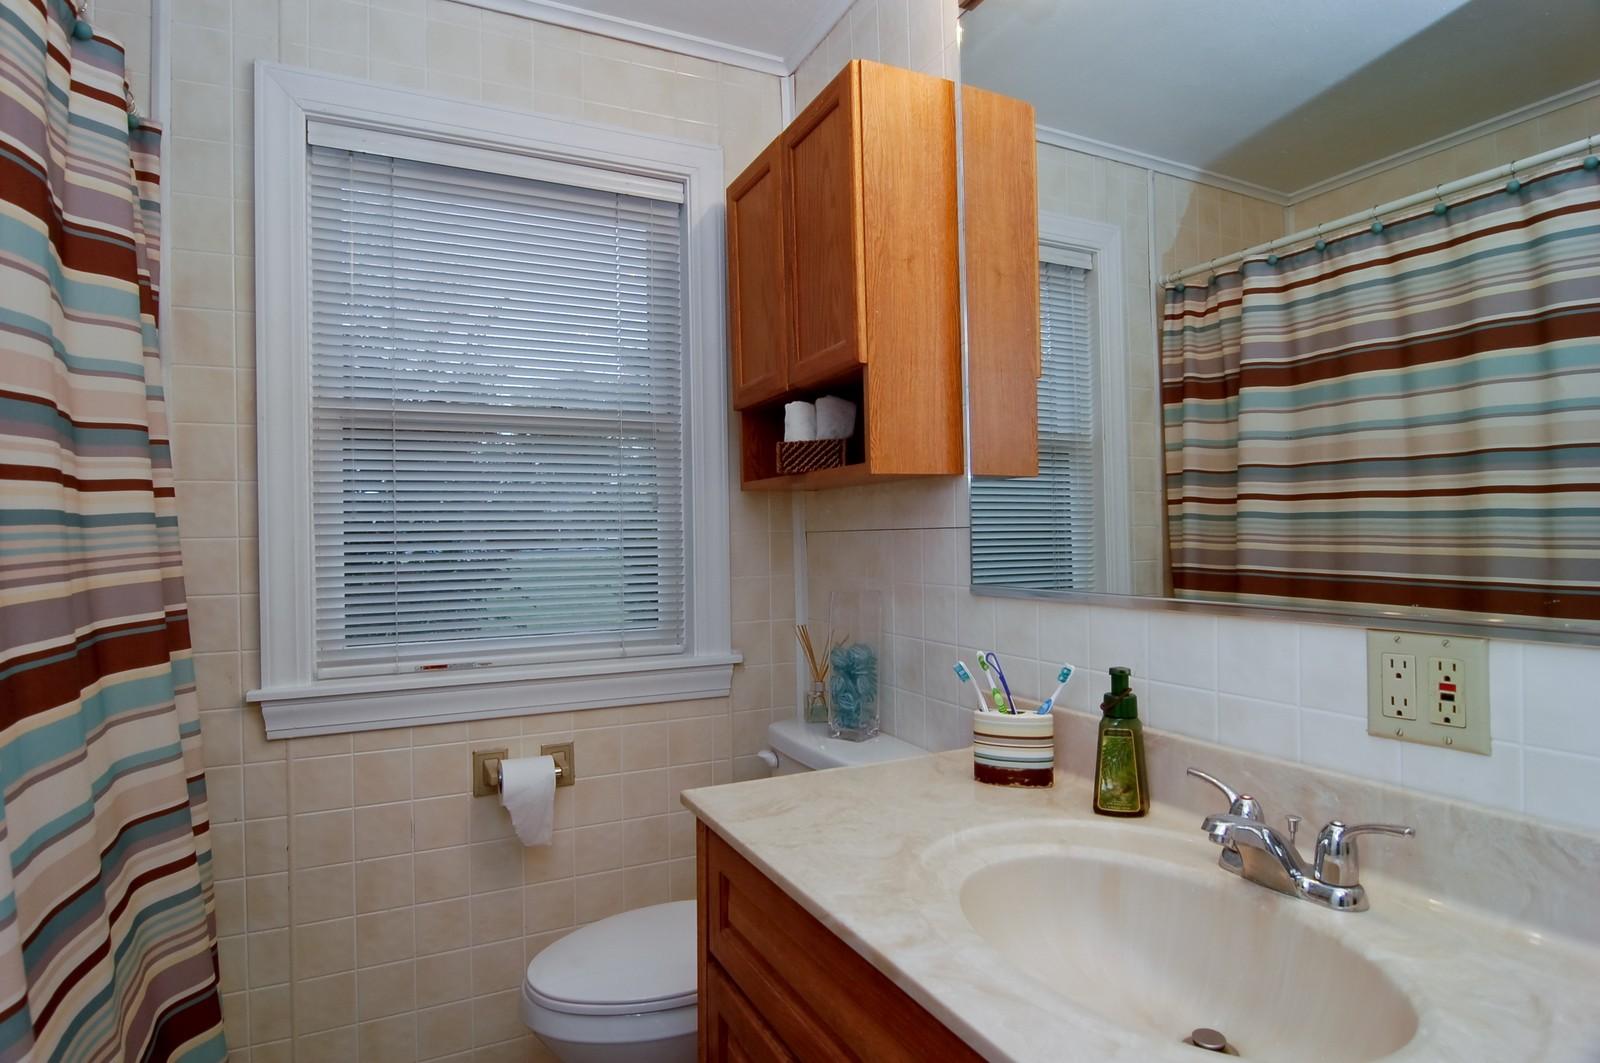 Real Estate Photography - 1040 S Columbine St, Lombard, IL, 60148 - Bathroom